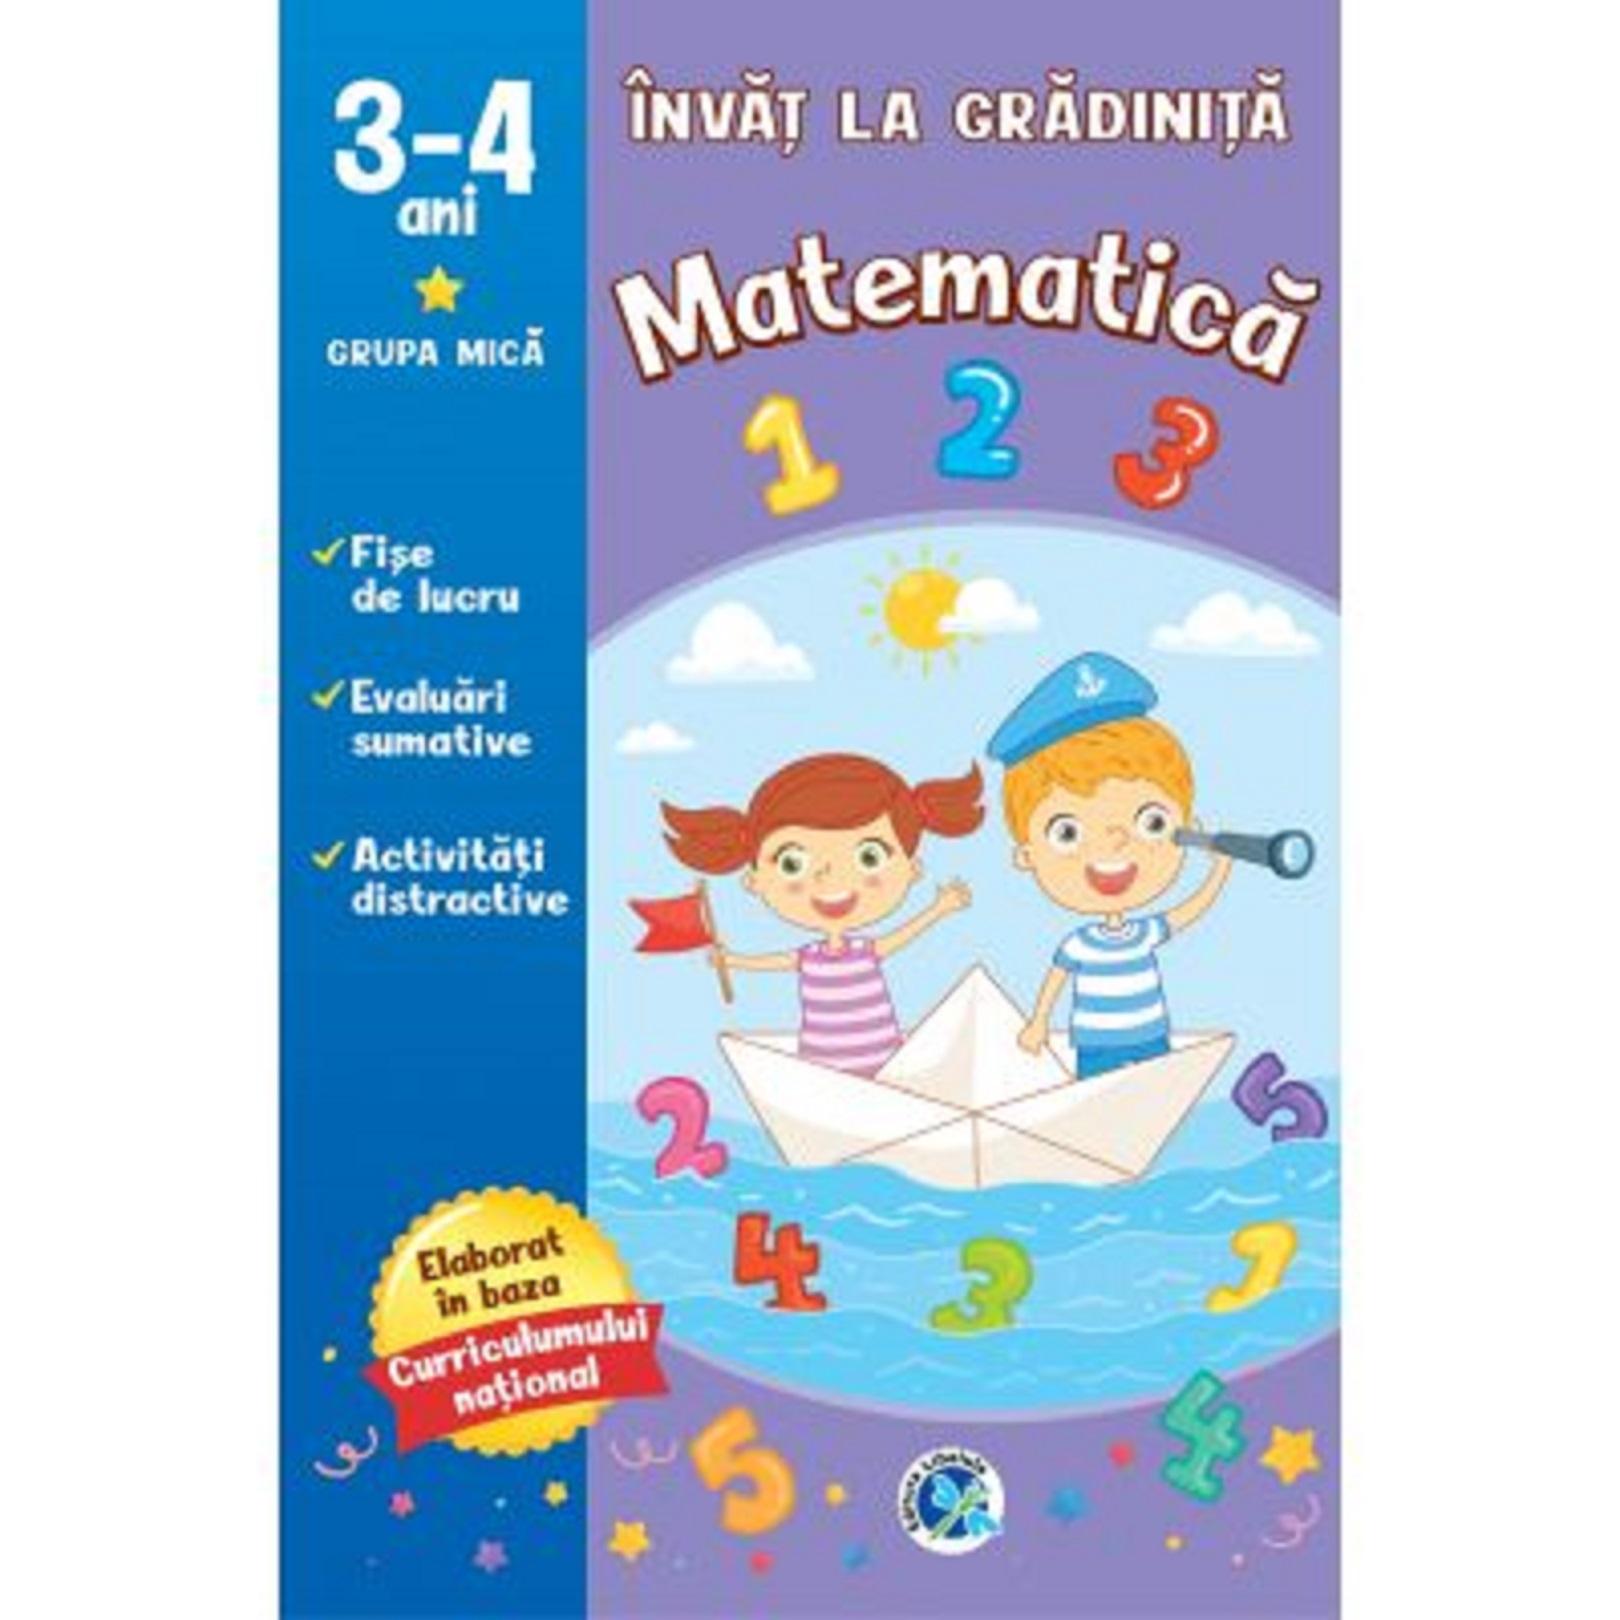 Matematica 3-4 ani |